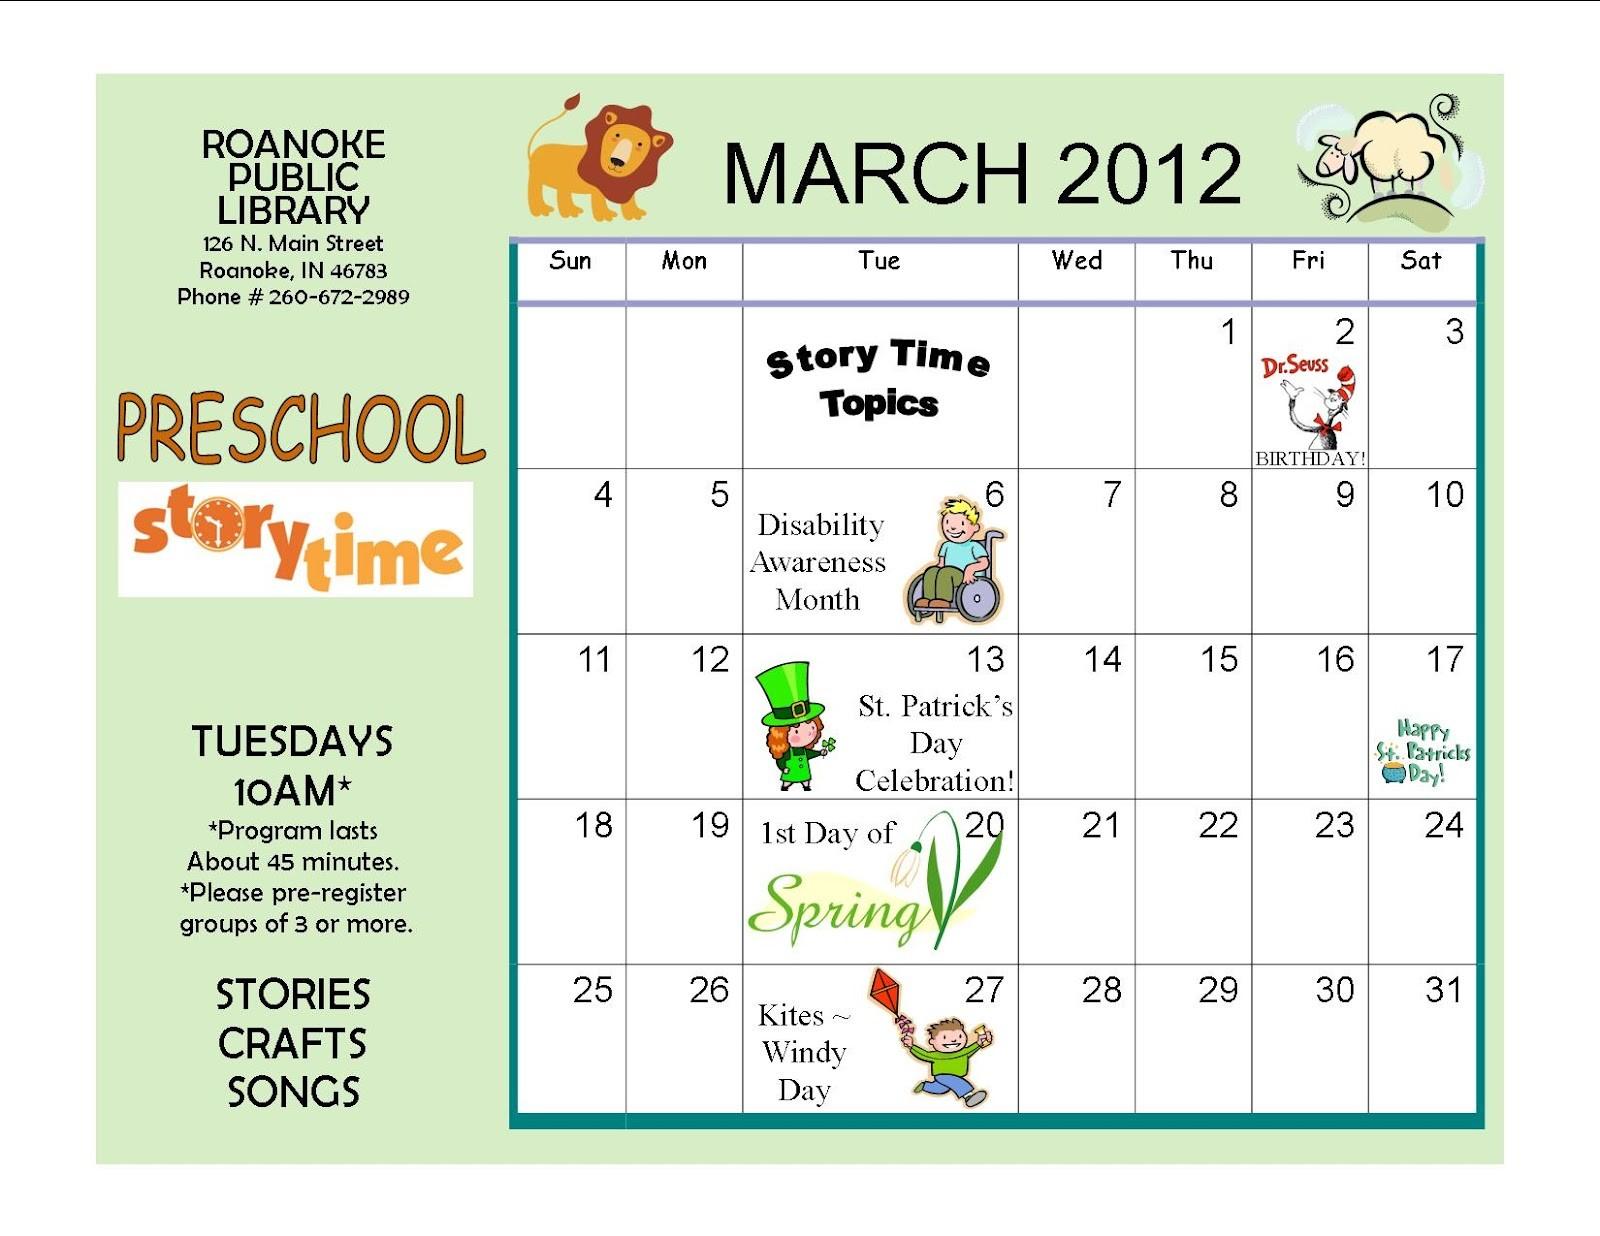 March Calendar Doodles Mejores Y Más Novedosos Preschool Calendar Template Lara Expolicenciaslatam Of March Calendar Doodles Más Caliente Free Printable 2017 Calendar Printables Pinterest